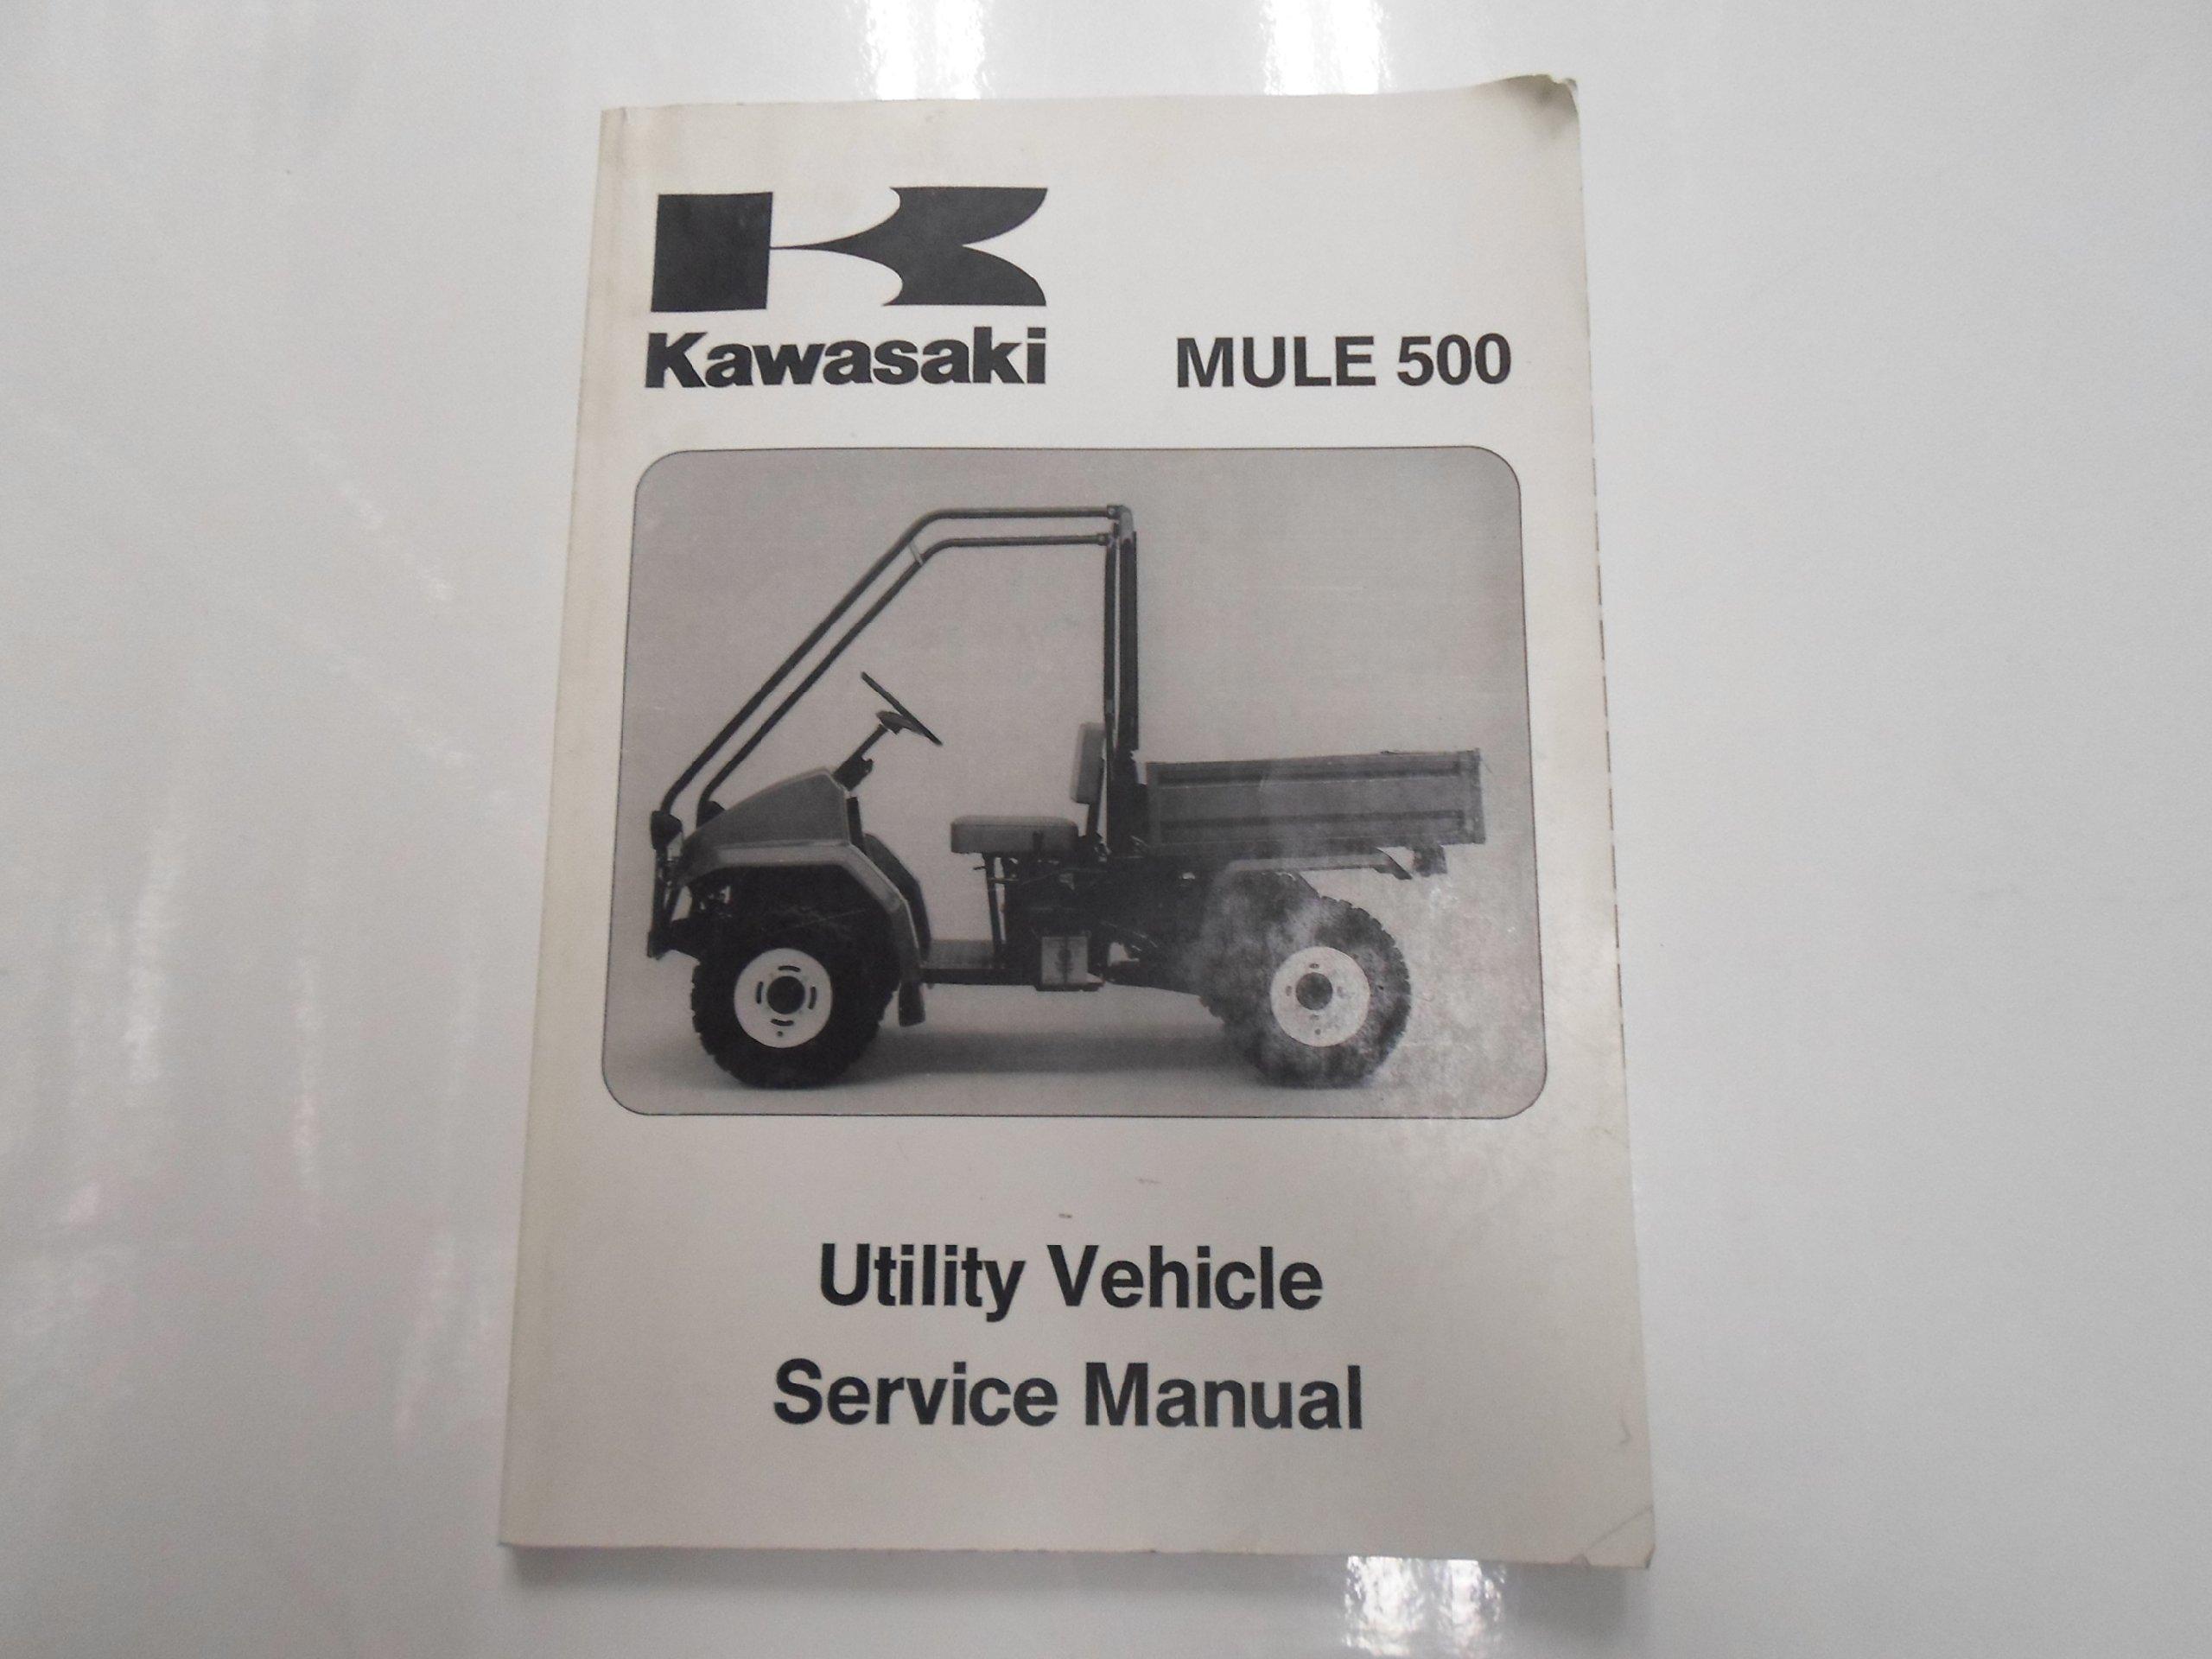 1991 1996 Kawasaki Mule 500 Utility Vehicle Service Repair Shop Manual:  KAWASAKI: Amazon.com: Books